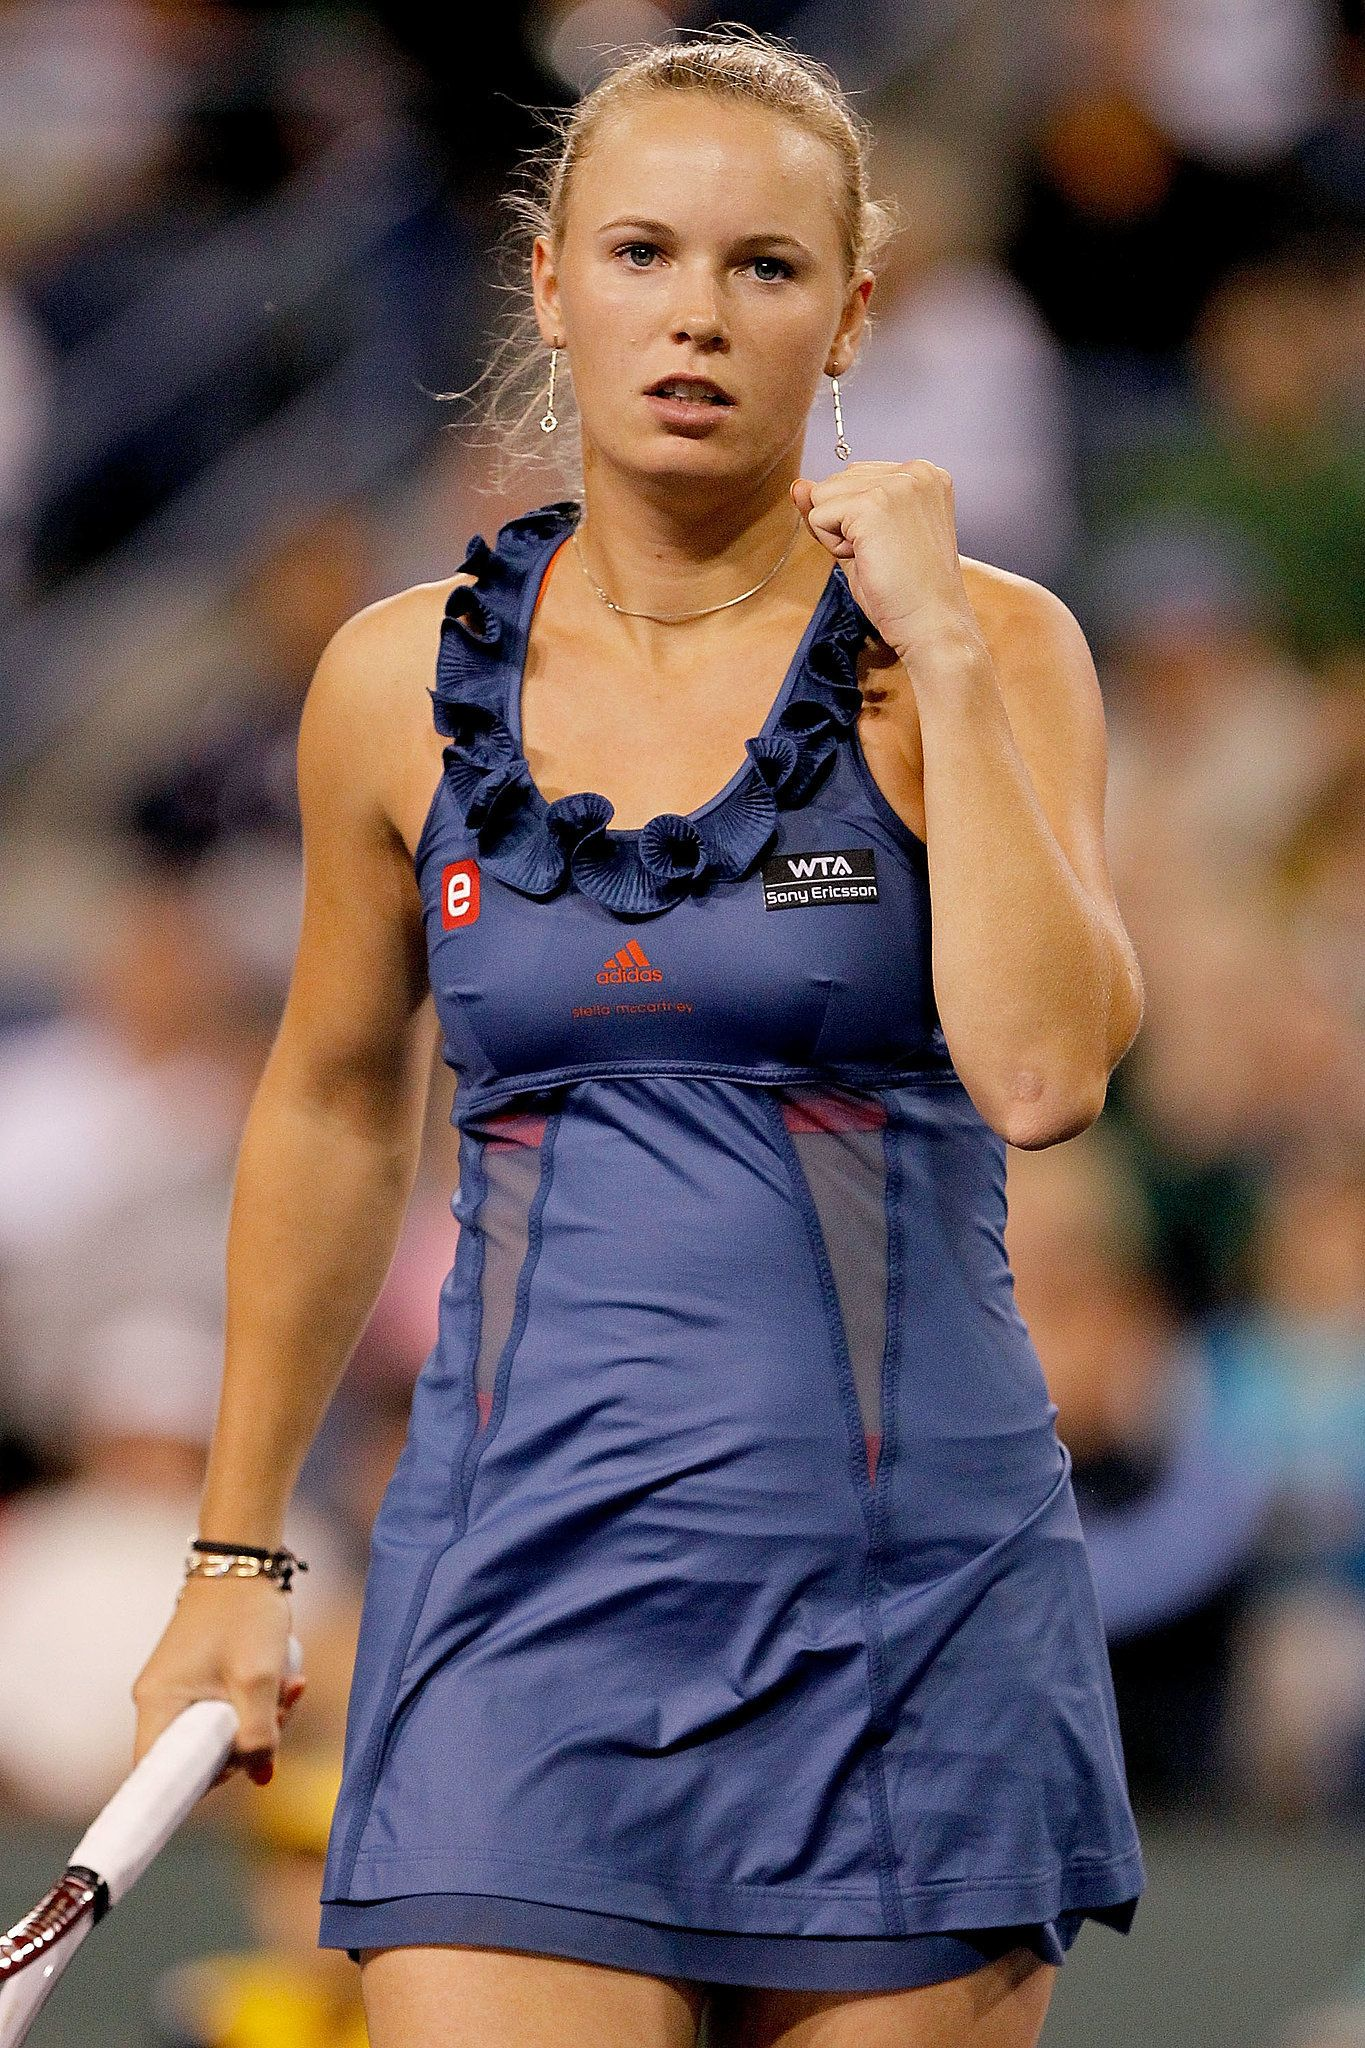 Caroline Wozniacki Debuted Adidas By Stella Mccartney Tennis Ruffle We Ve Got Nothing But Love For These Ace Tenni Tennis Dress Tennis Clothes Tennis Fashion